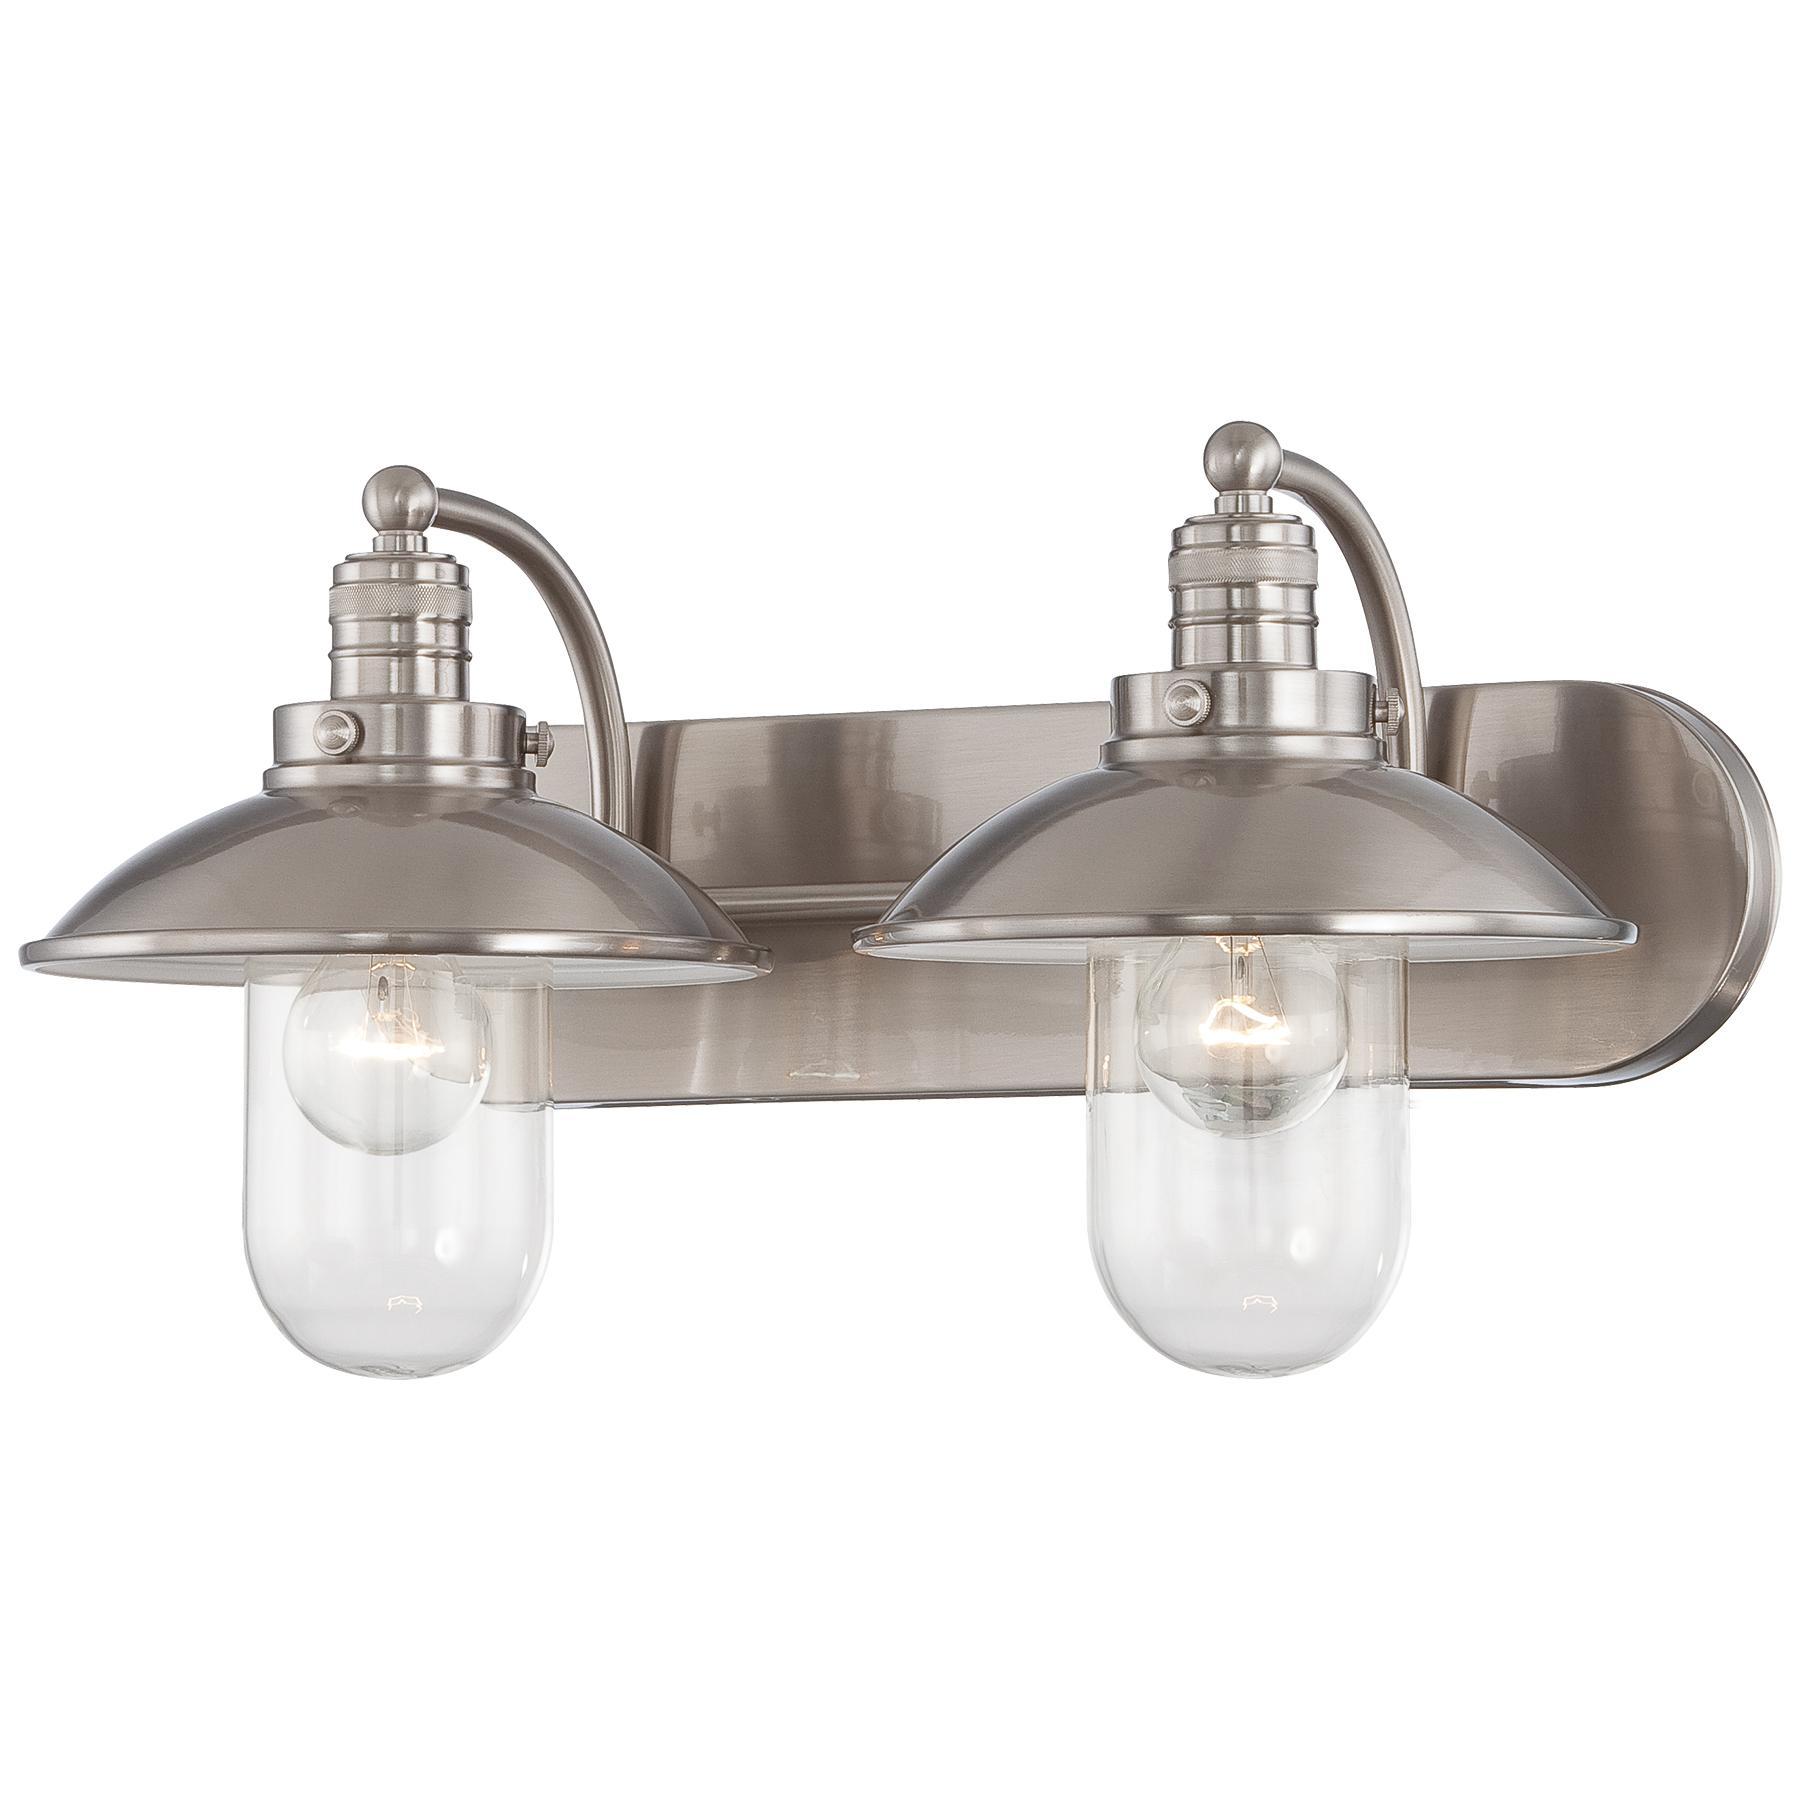 Downtown Edison Shade Bathroom Vanity Light By Minka Lavery - Minka lavery bathroom mirrors